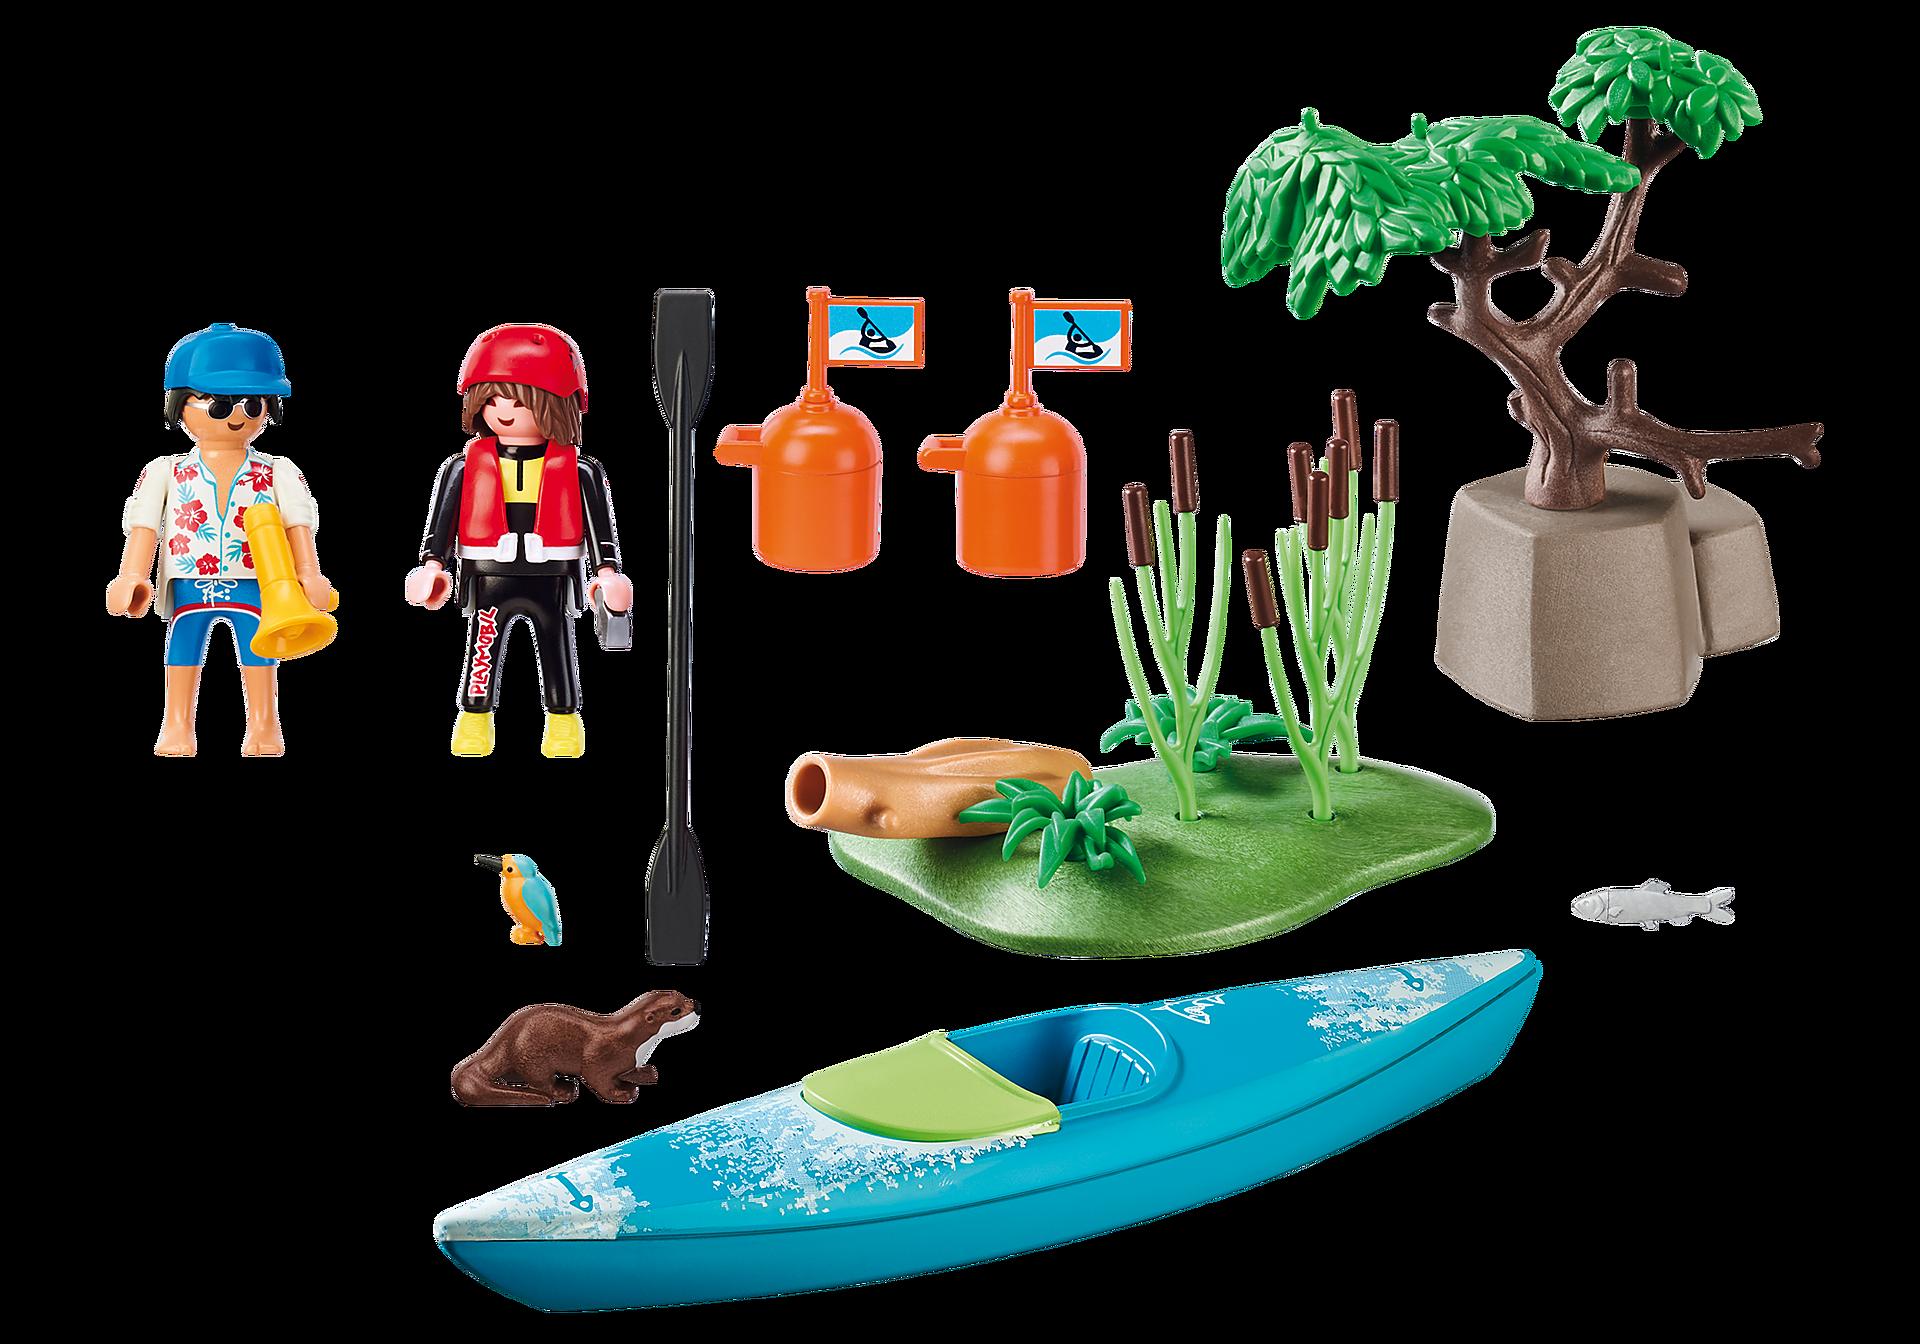 70035 StarterPack Sportifs et kayak zoom image3